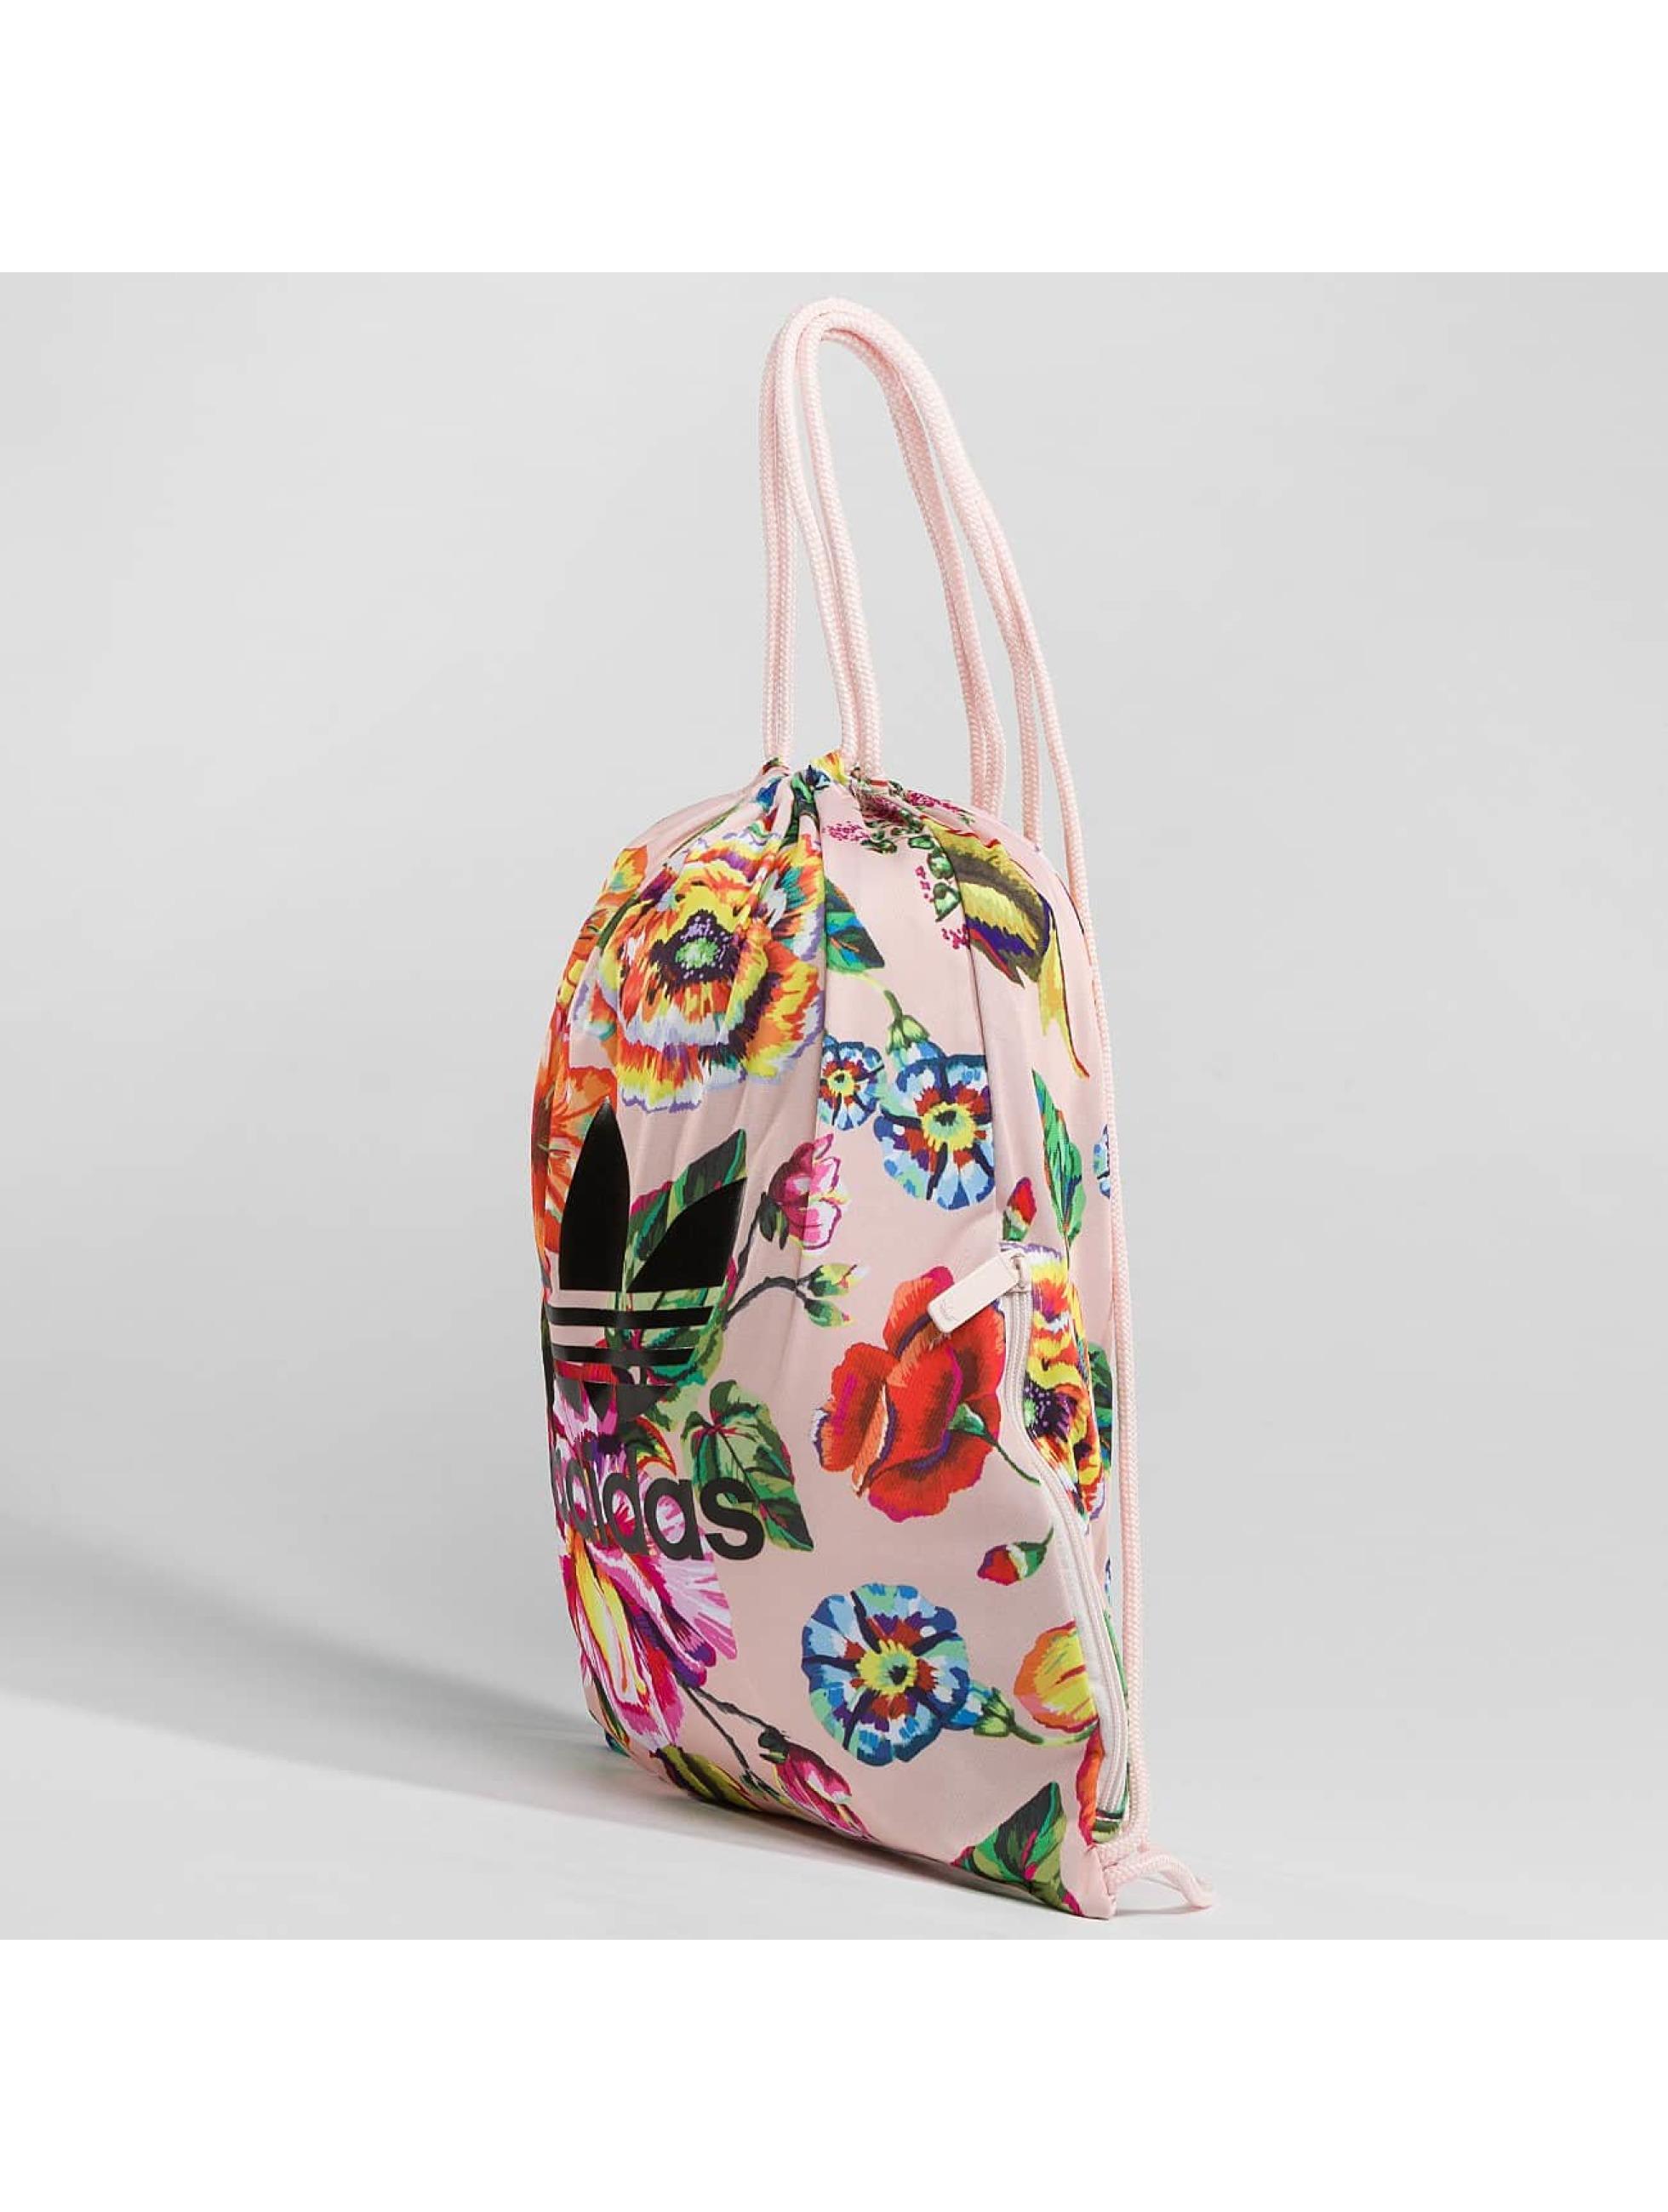 adidas Sac à cordons Floralita multicolore